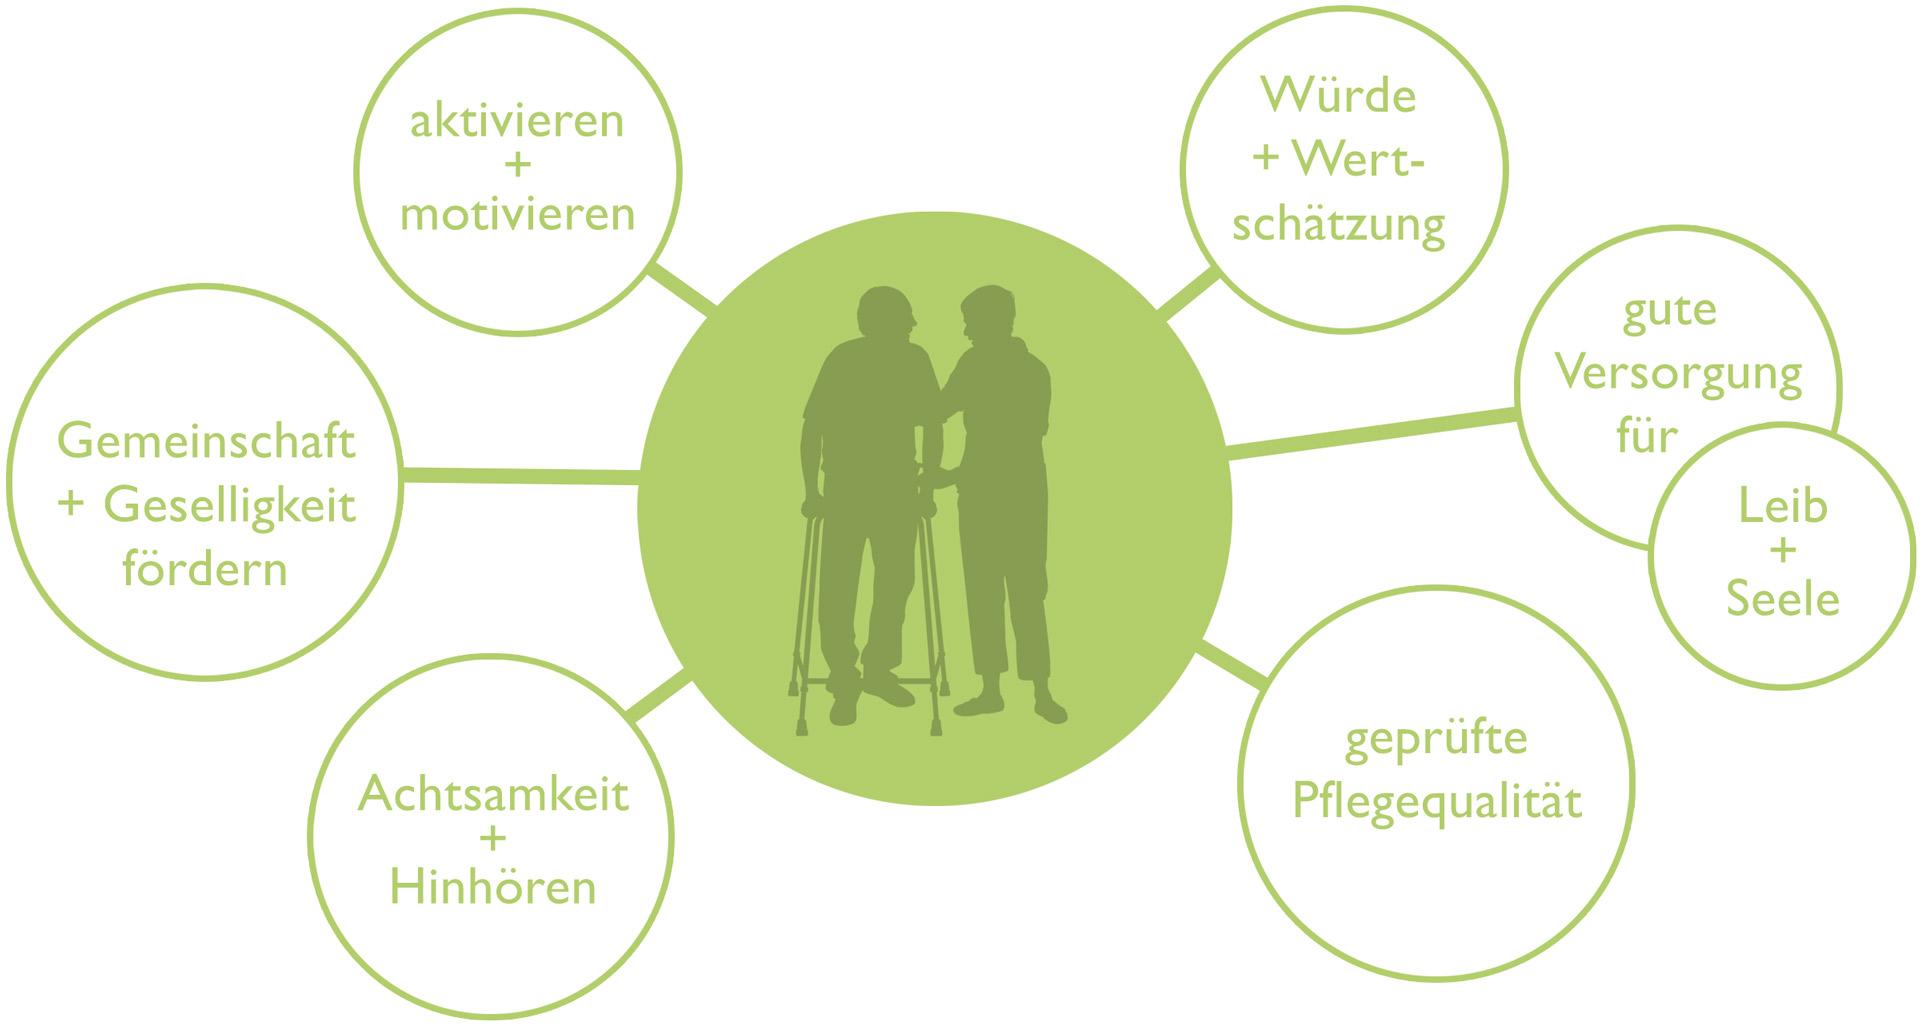 Pflege-Leitbild des Löhlbacher Hofs